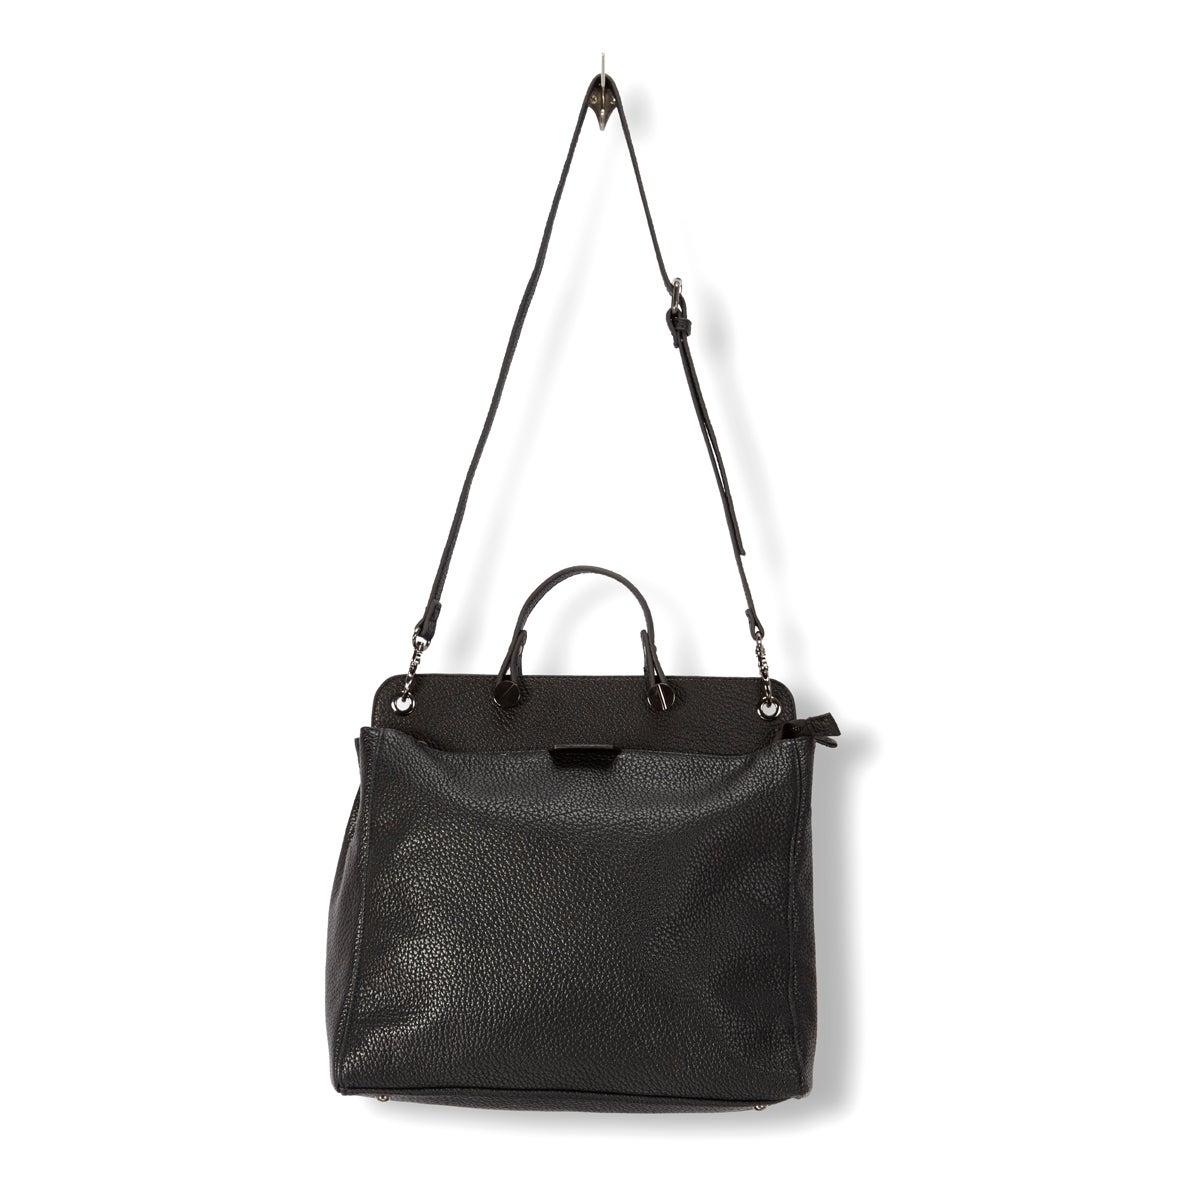 Lds Fara black large tote bag